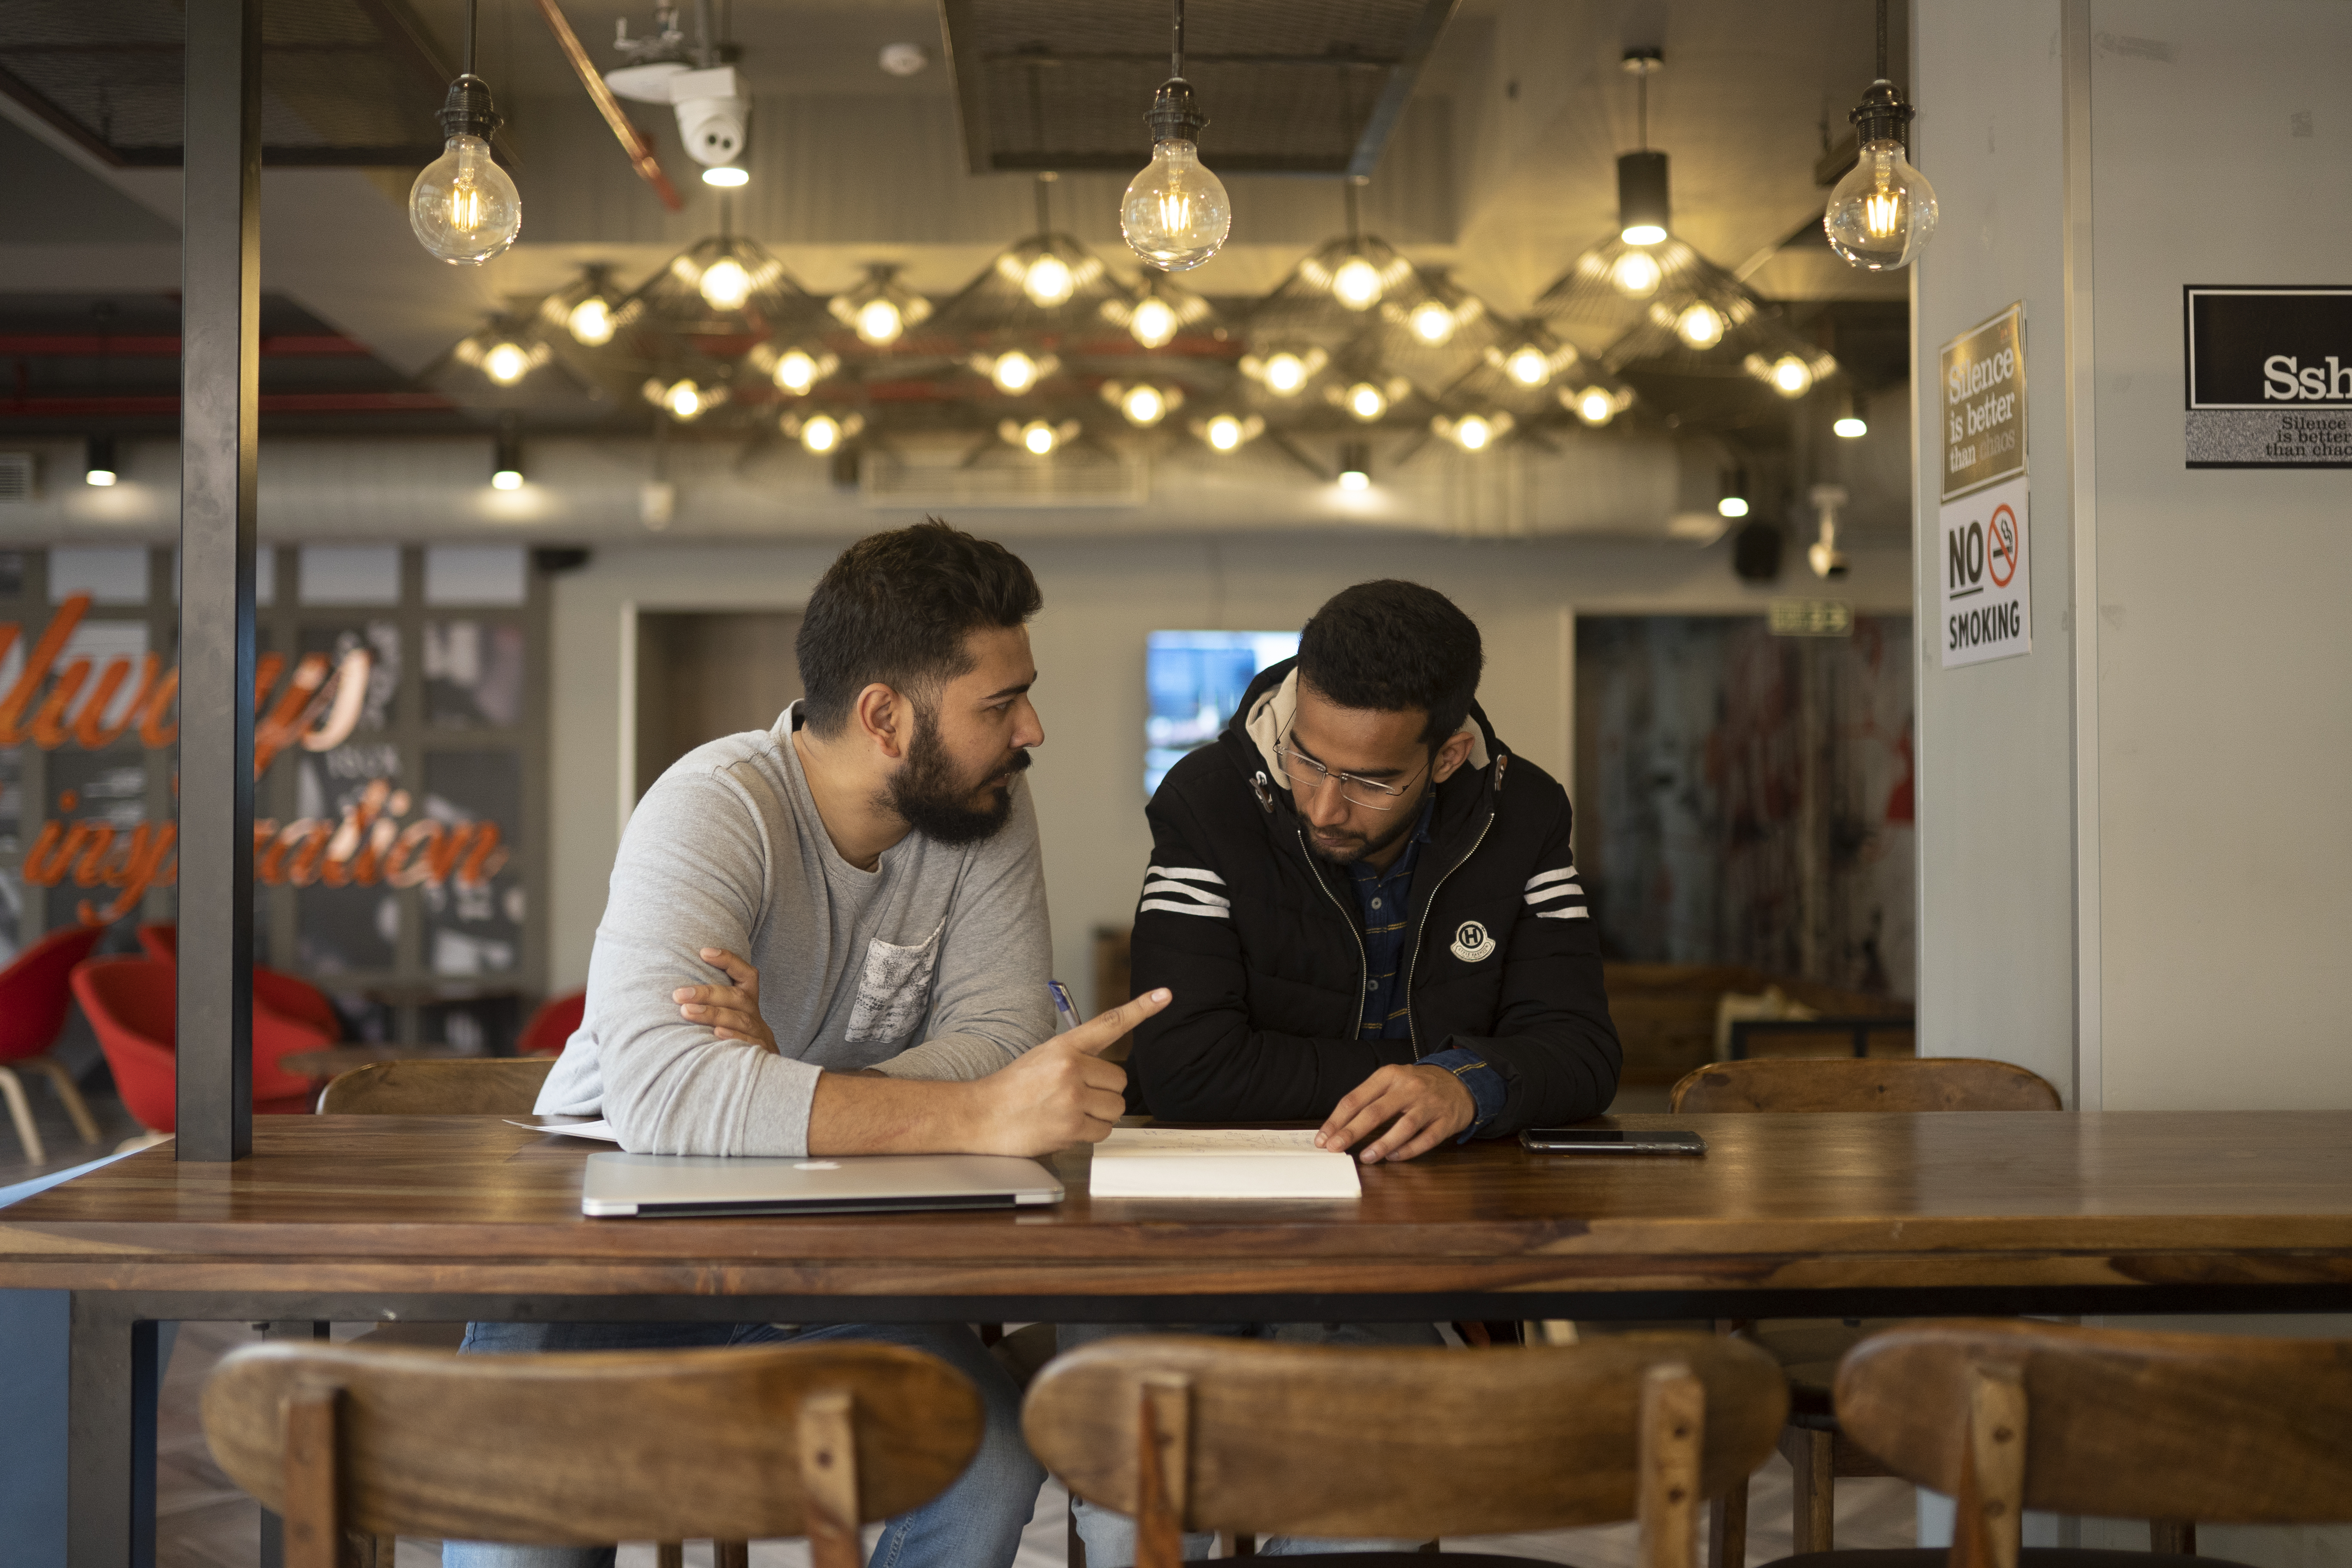 Zubair meets with his business partner Suarav Mahta at the AddtoGoogle office in Nehru Place, New Delhi, India (AtlasNetwork.org/Bernat Parera).